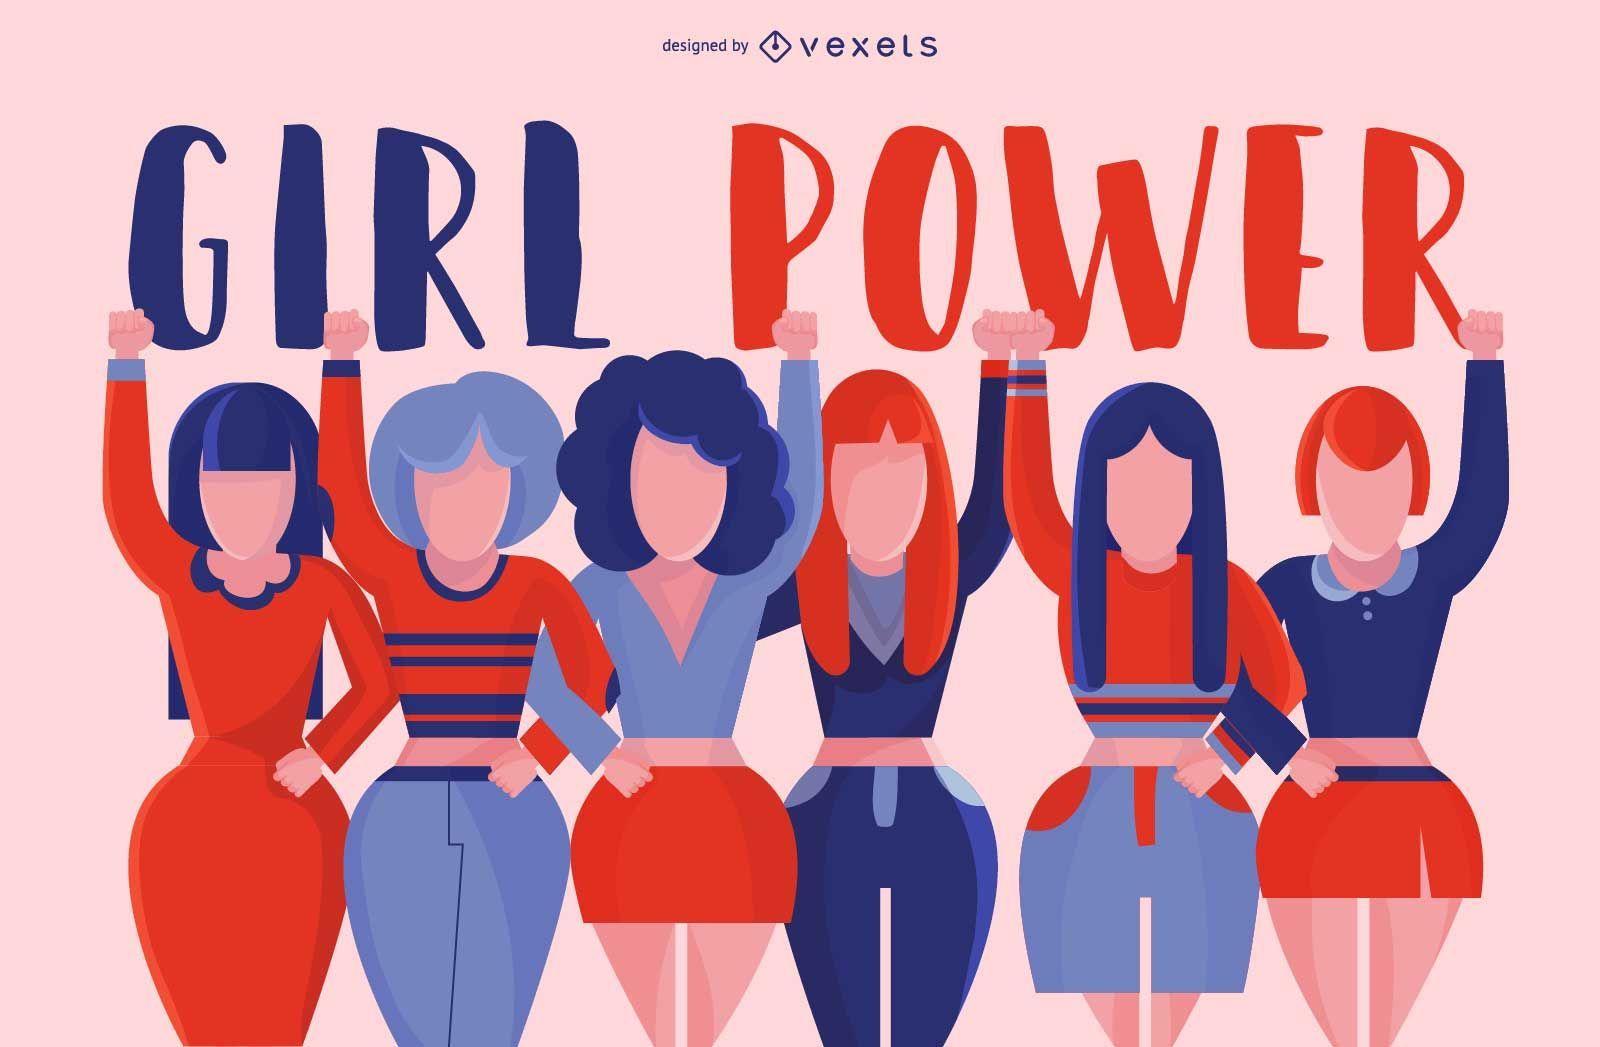 Dise?o de grupo de poder femenino